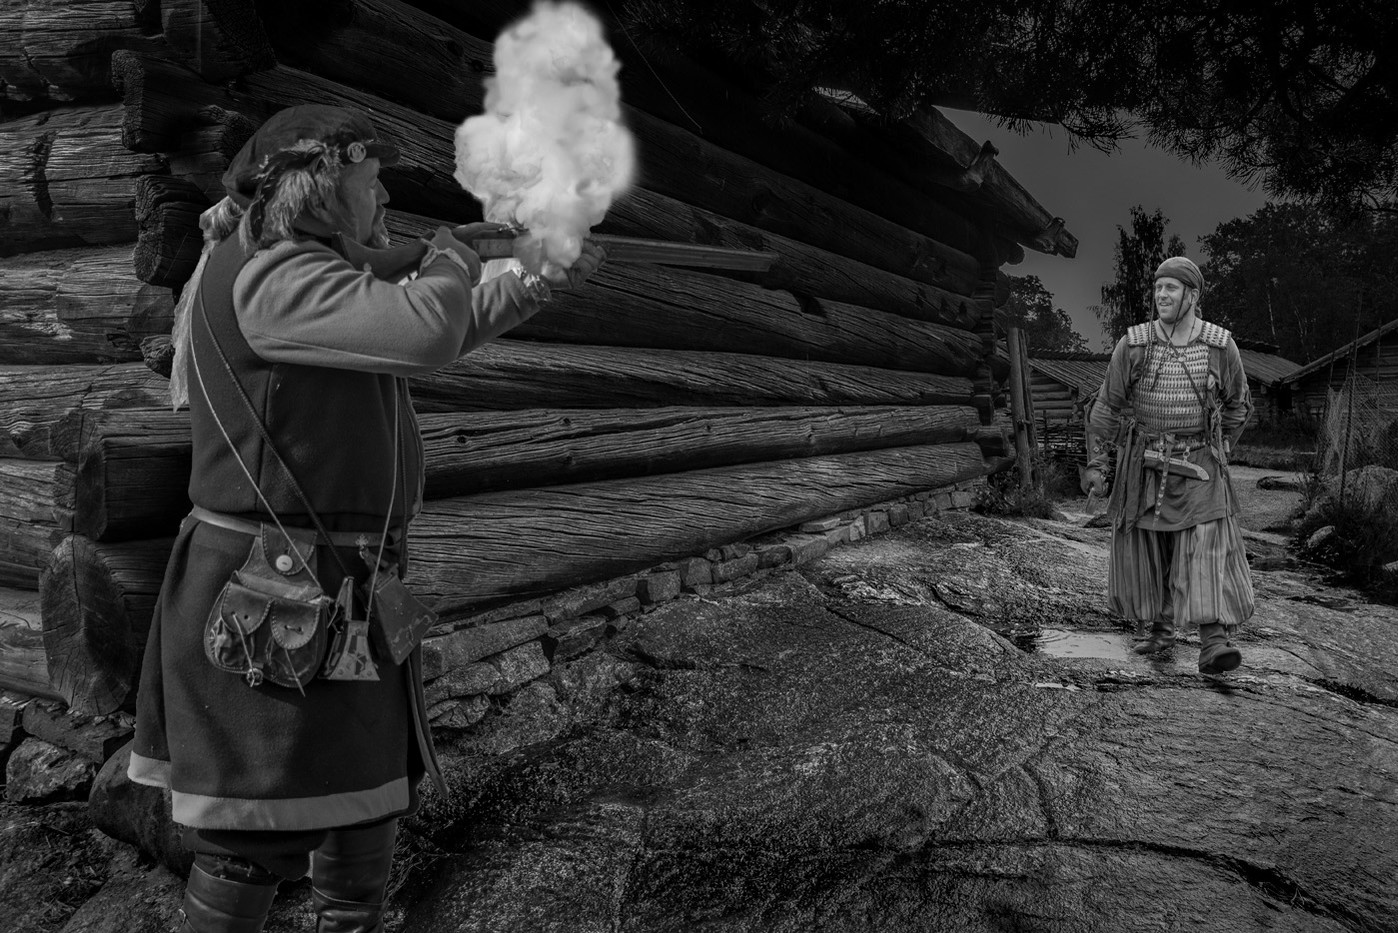 15 SMOKE WITHOUT FIRE by Alan Cork